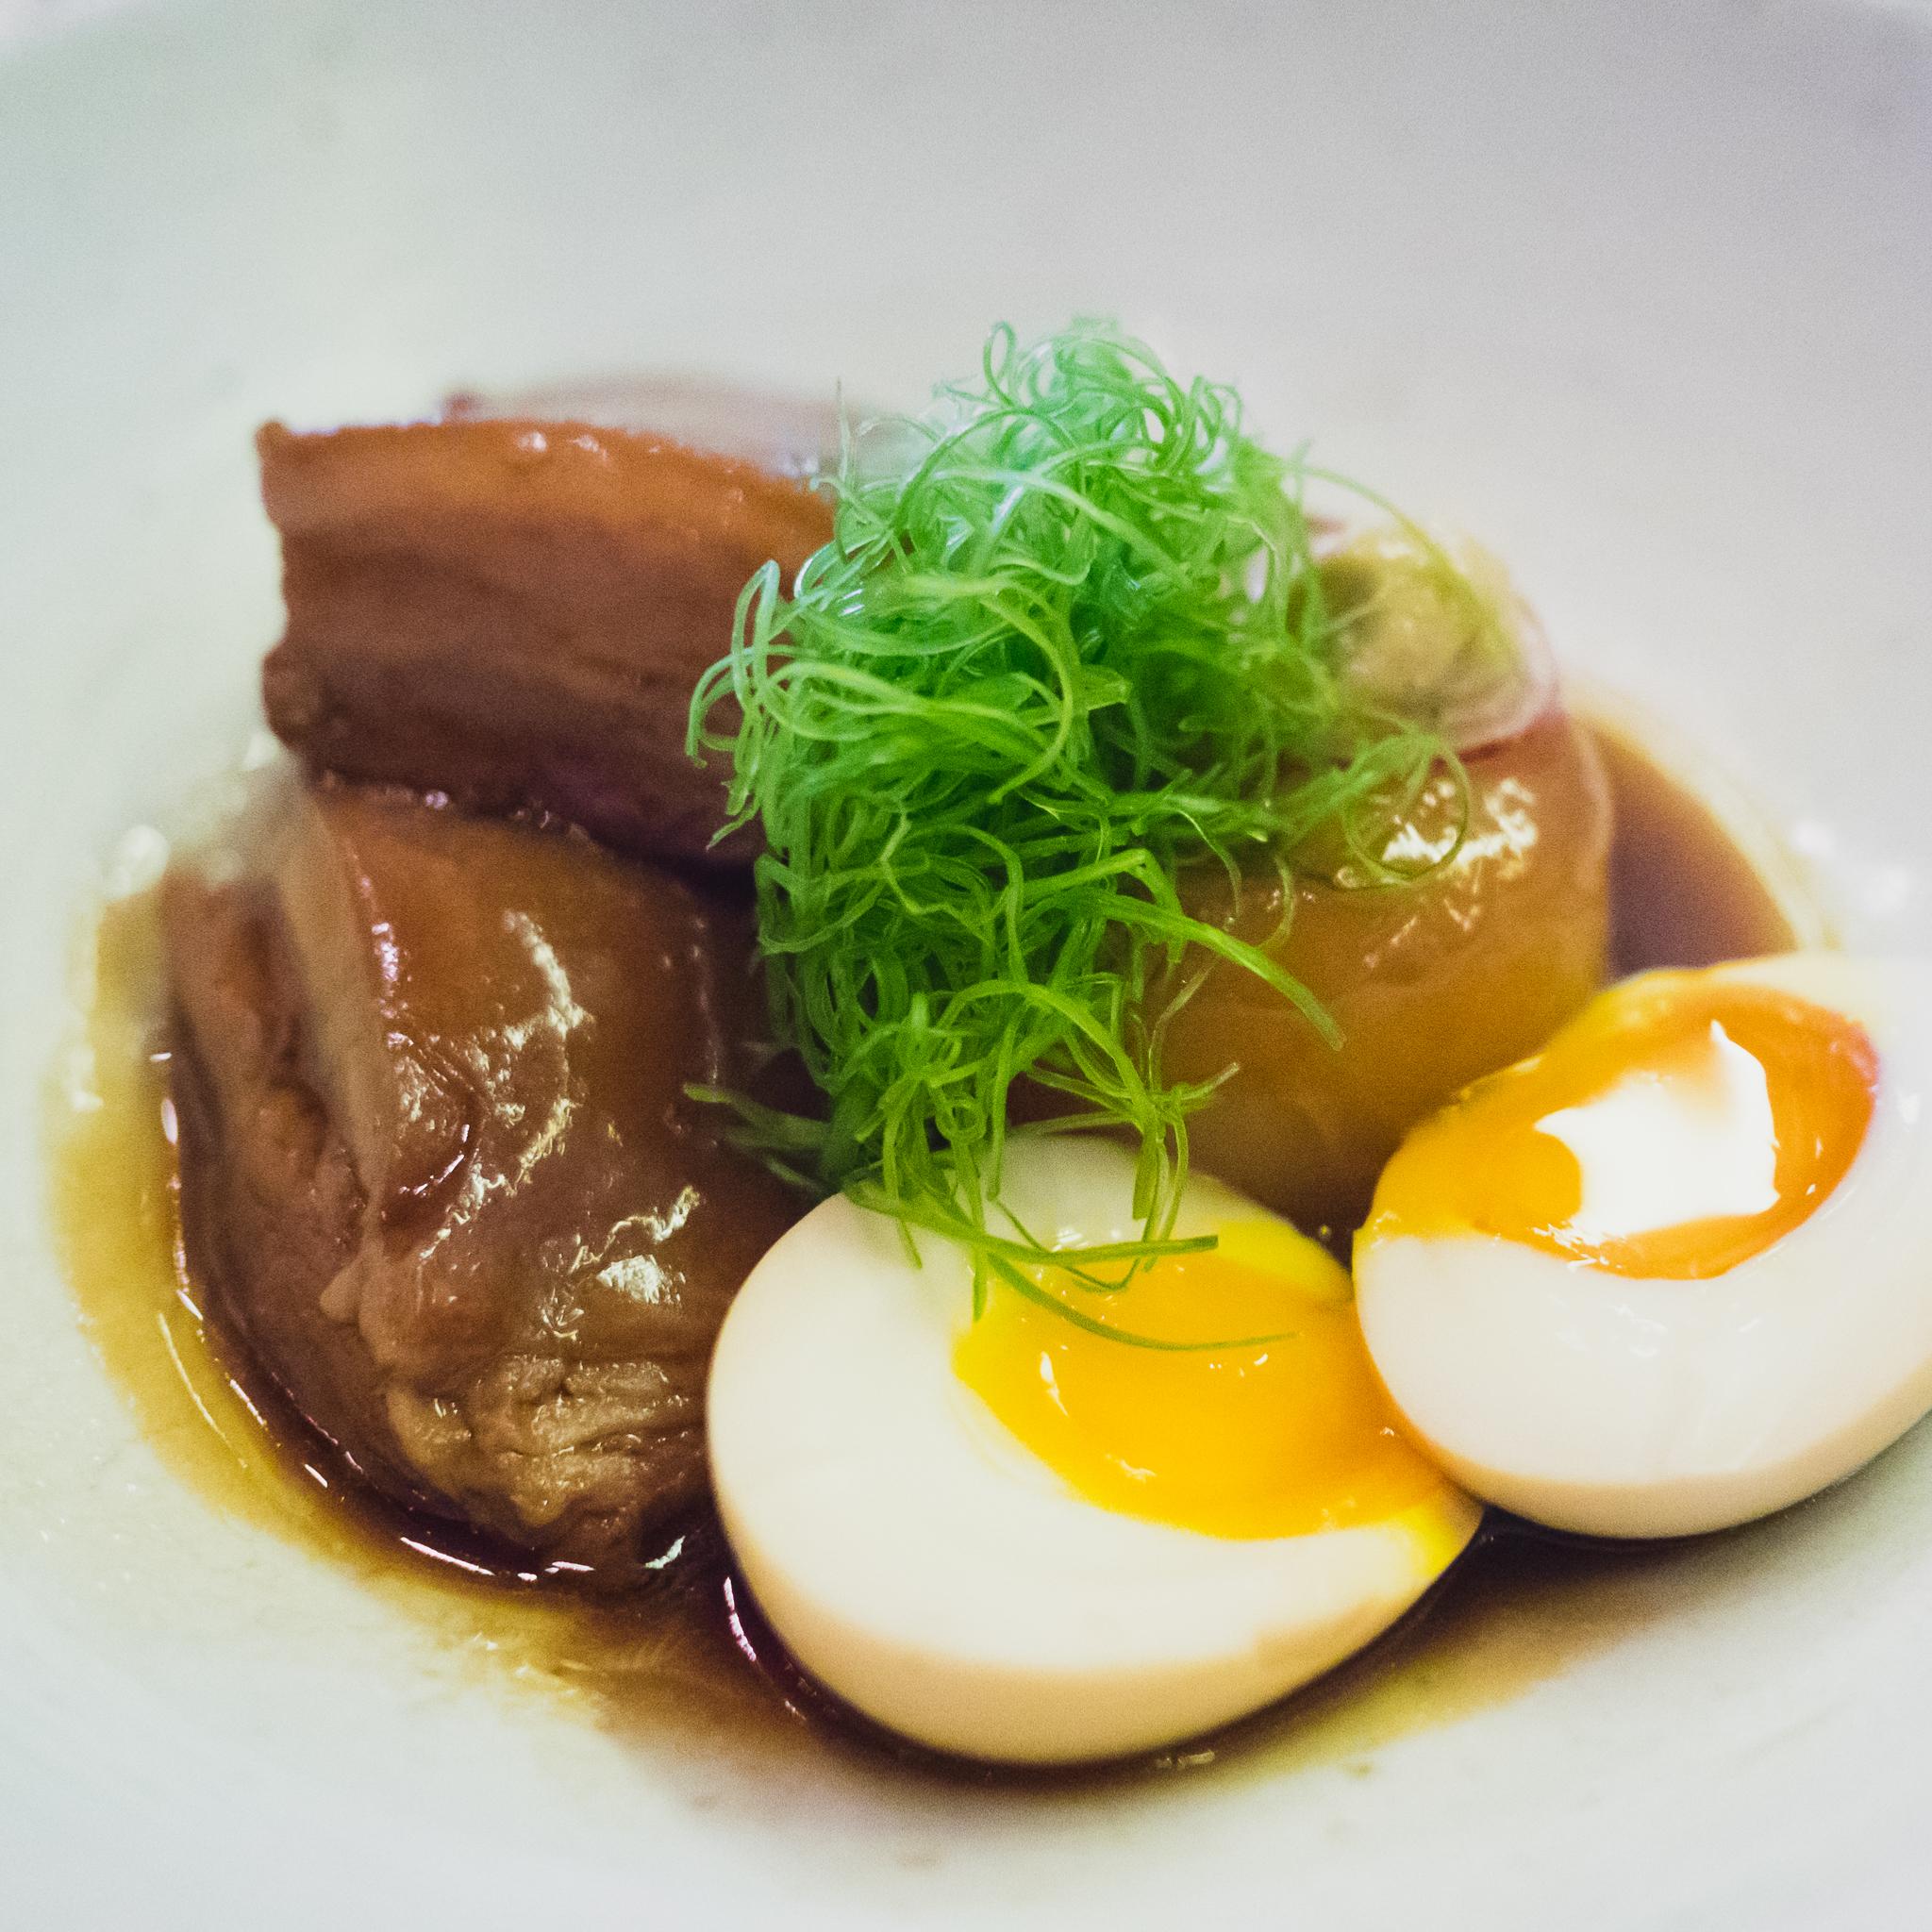 niman ranch pork belly kakuni , half boiled free range egg and daikon.